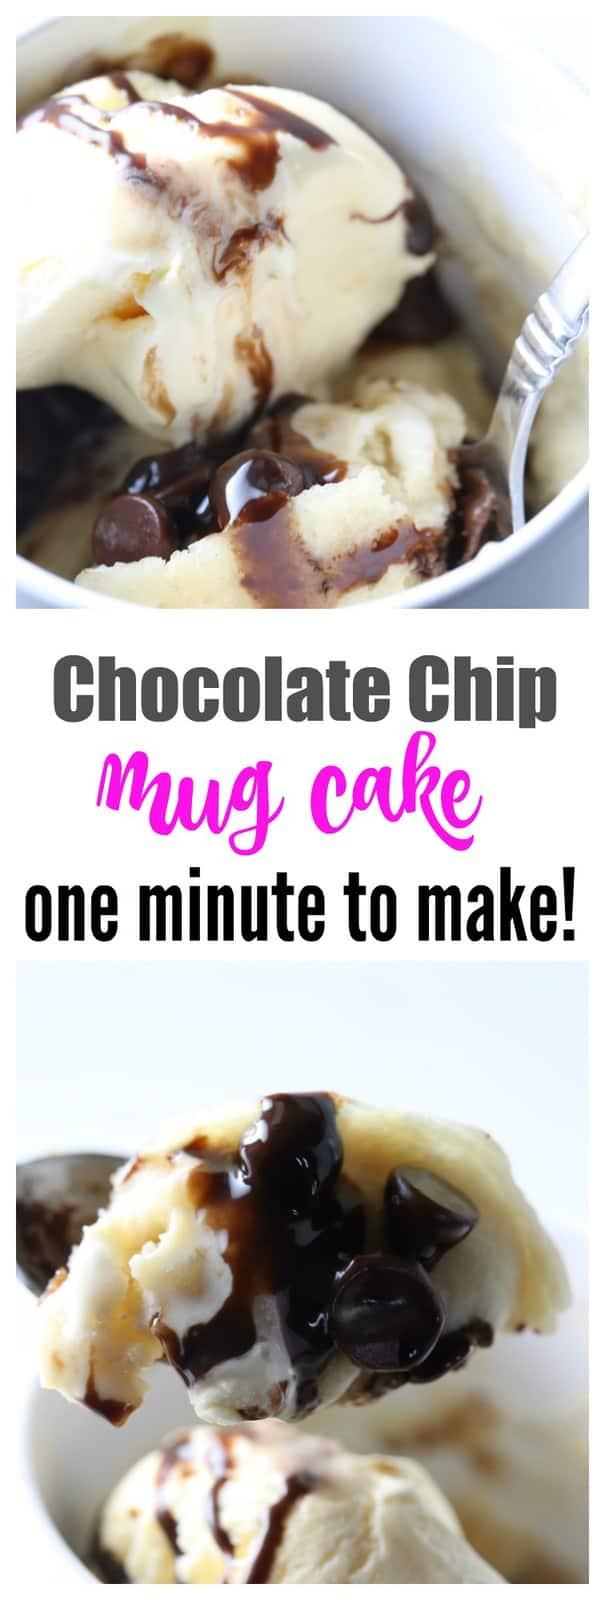 One Minute Chocolate Chip Mug Cake